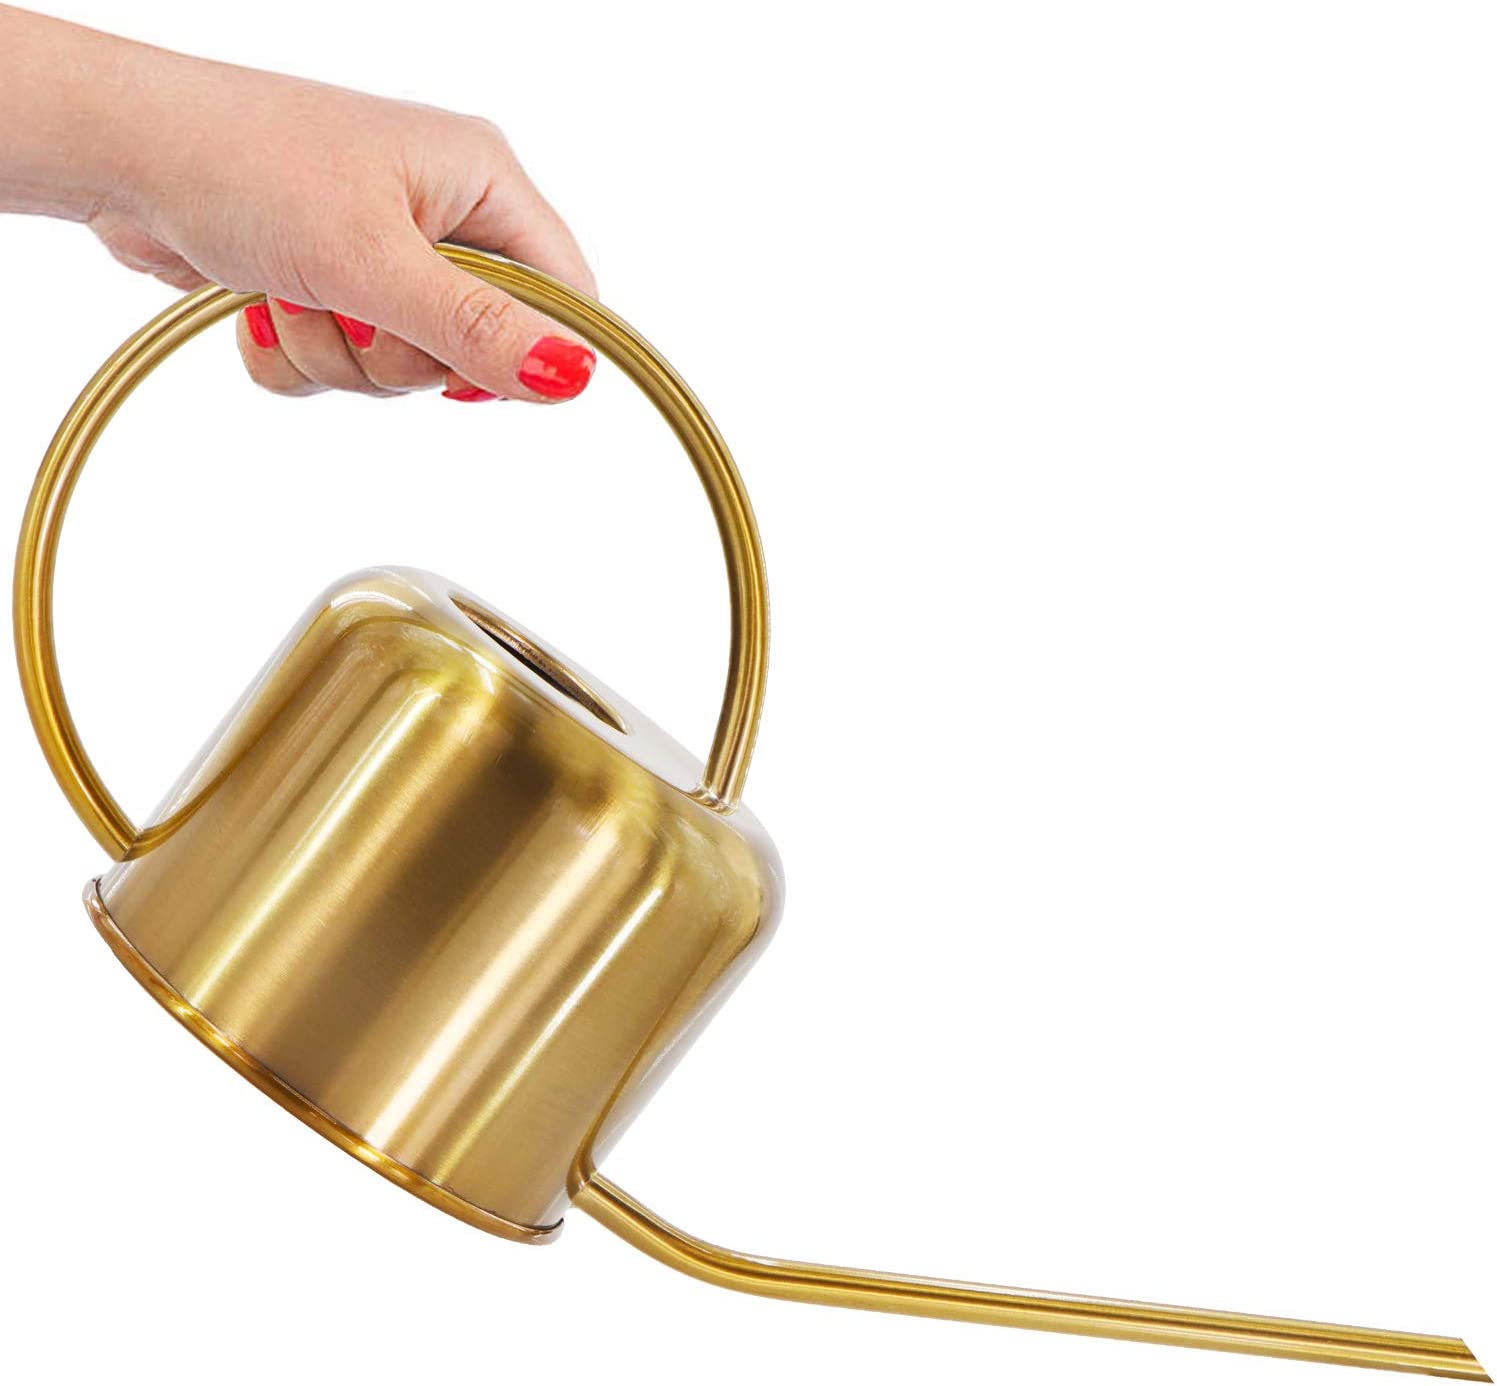 Wistwoxxon Metal Watering Can, 40 oz Copper Watering Can Indoor Outdoor, Long Spout Watering Can for Flower Plant